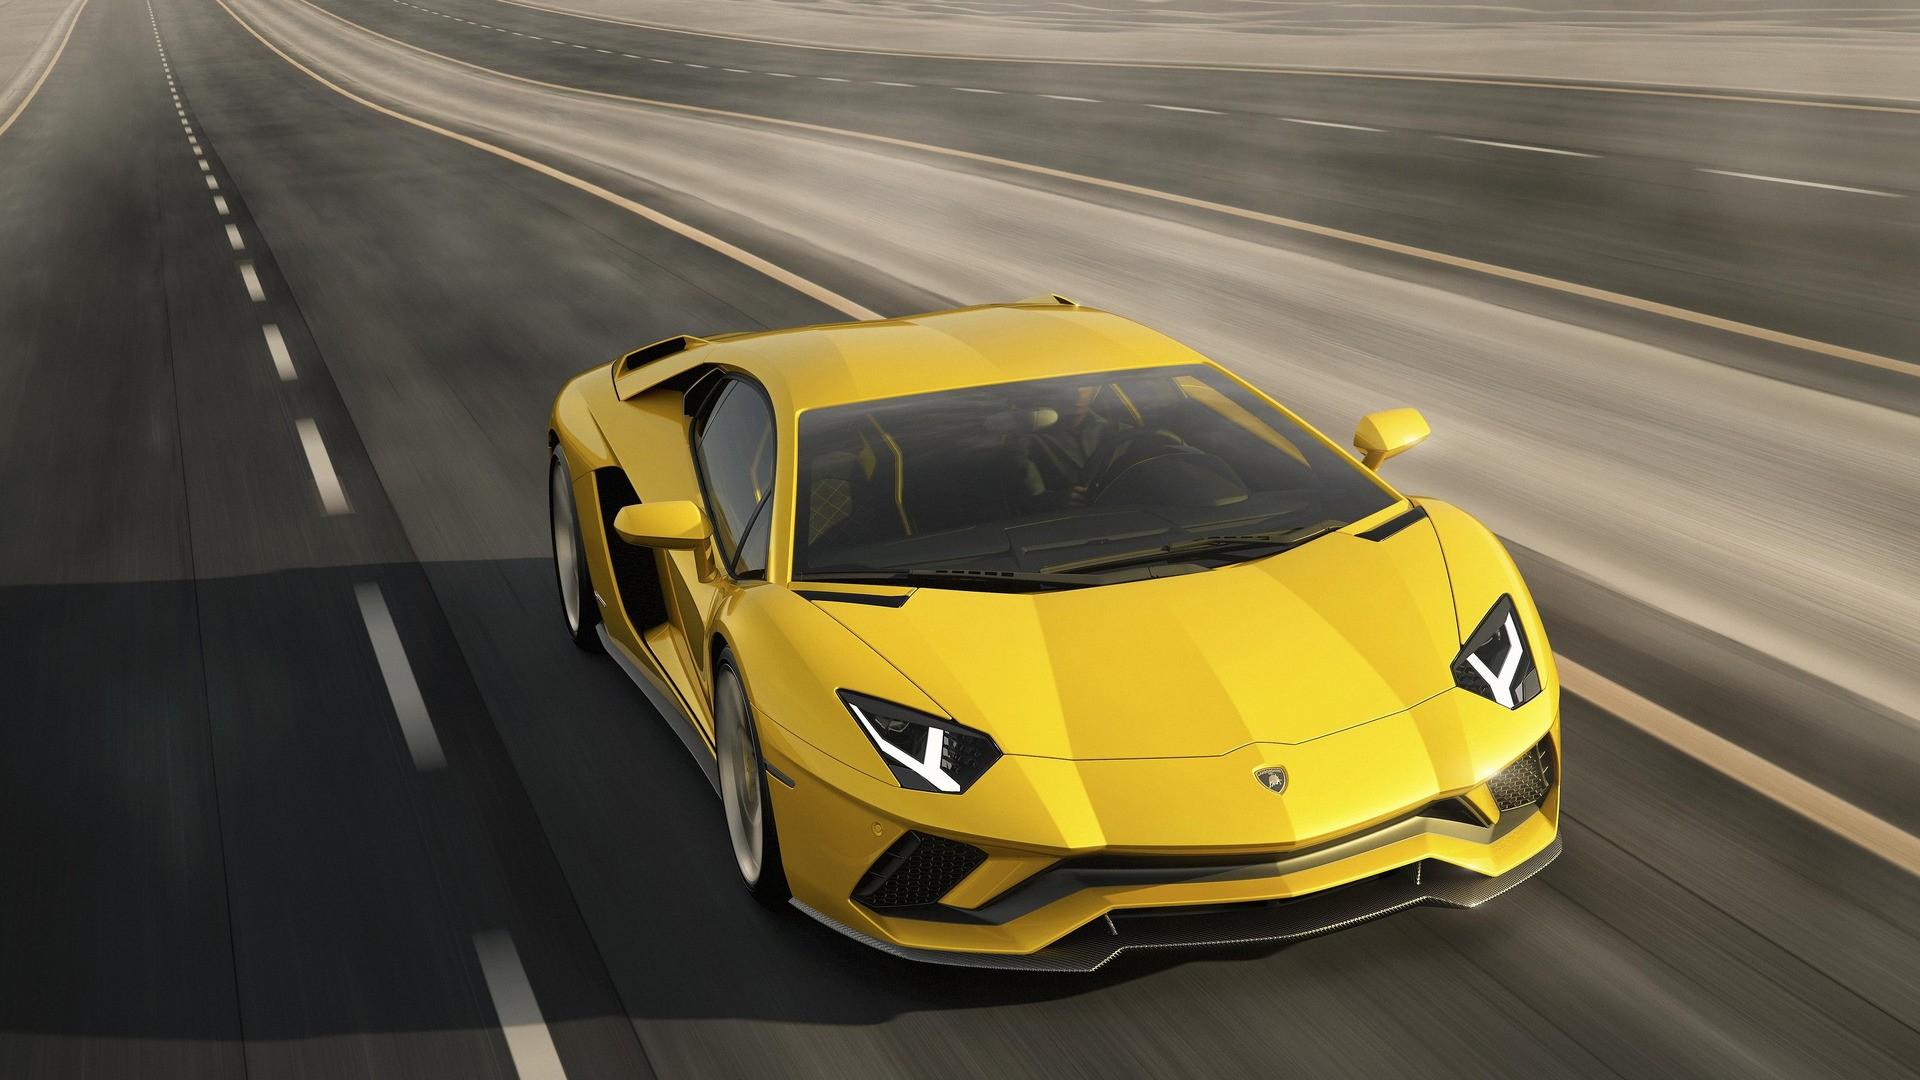 740-hp-lamborghini-aventador-s-mixes-4-wheel-steering-with-new-electronic-brain_1 Breathtaking Lamborghini Countach Owners Manual Pdf Cars Trend